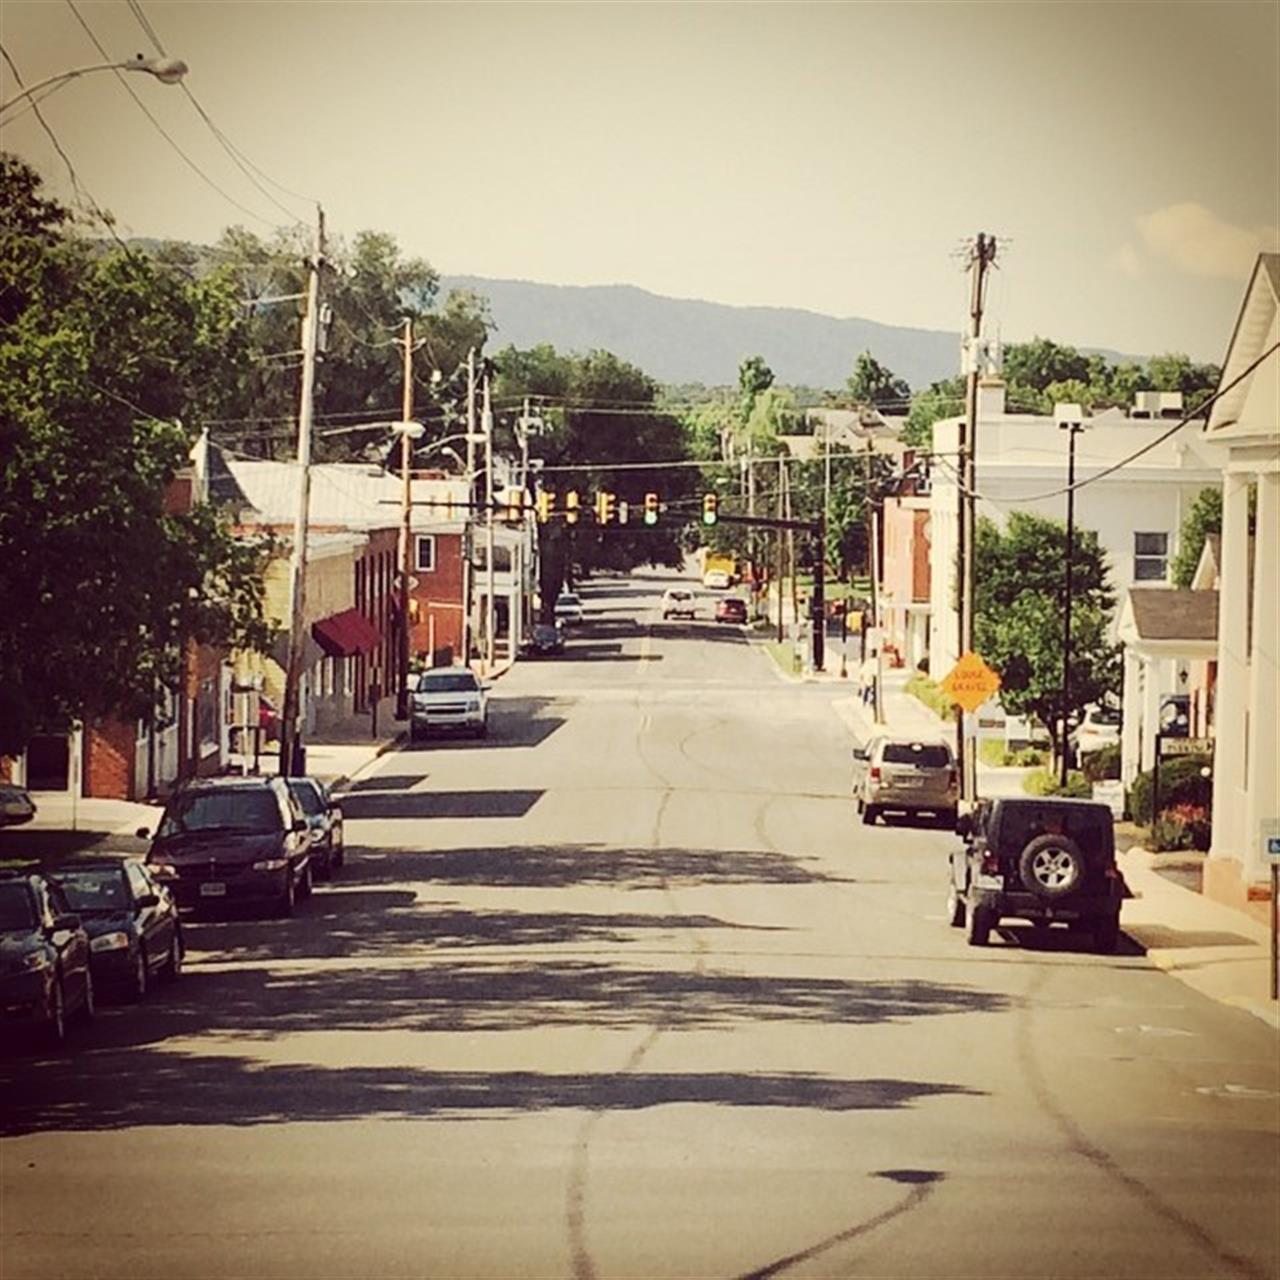 Town of Strasburg, VA